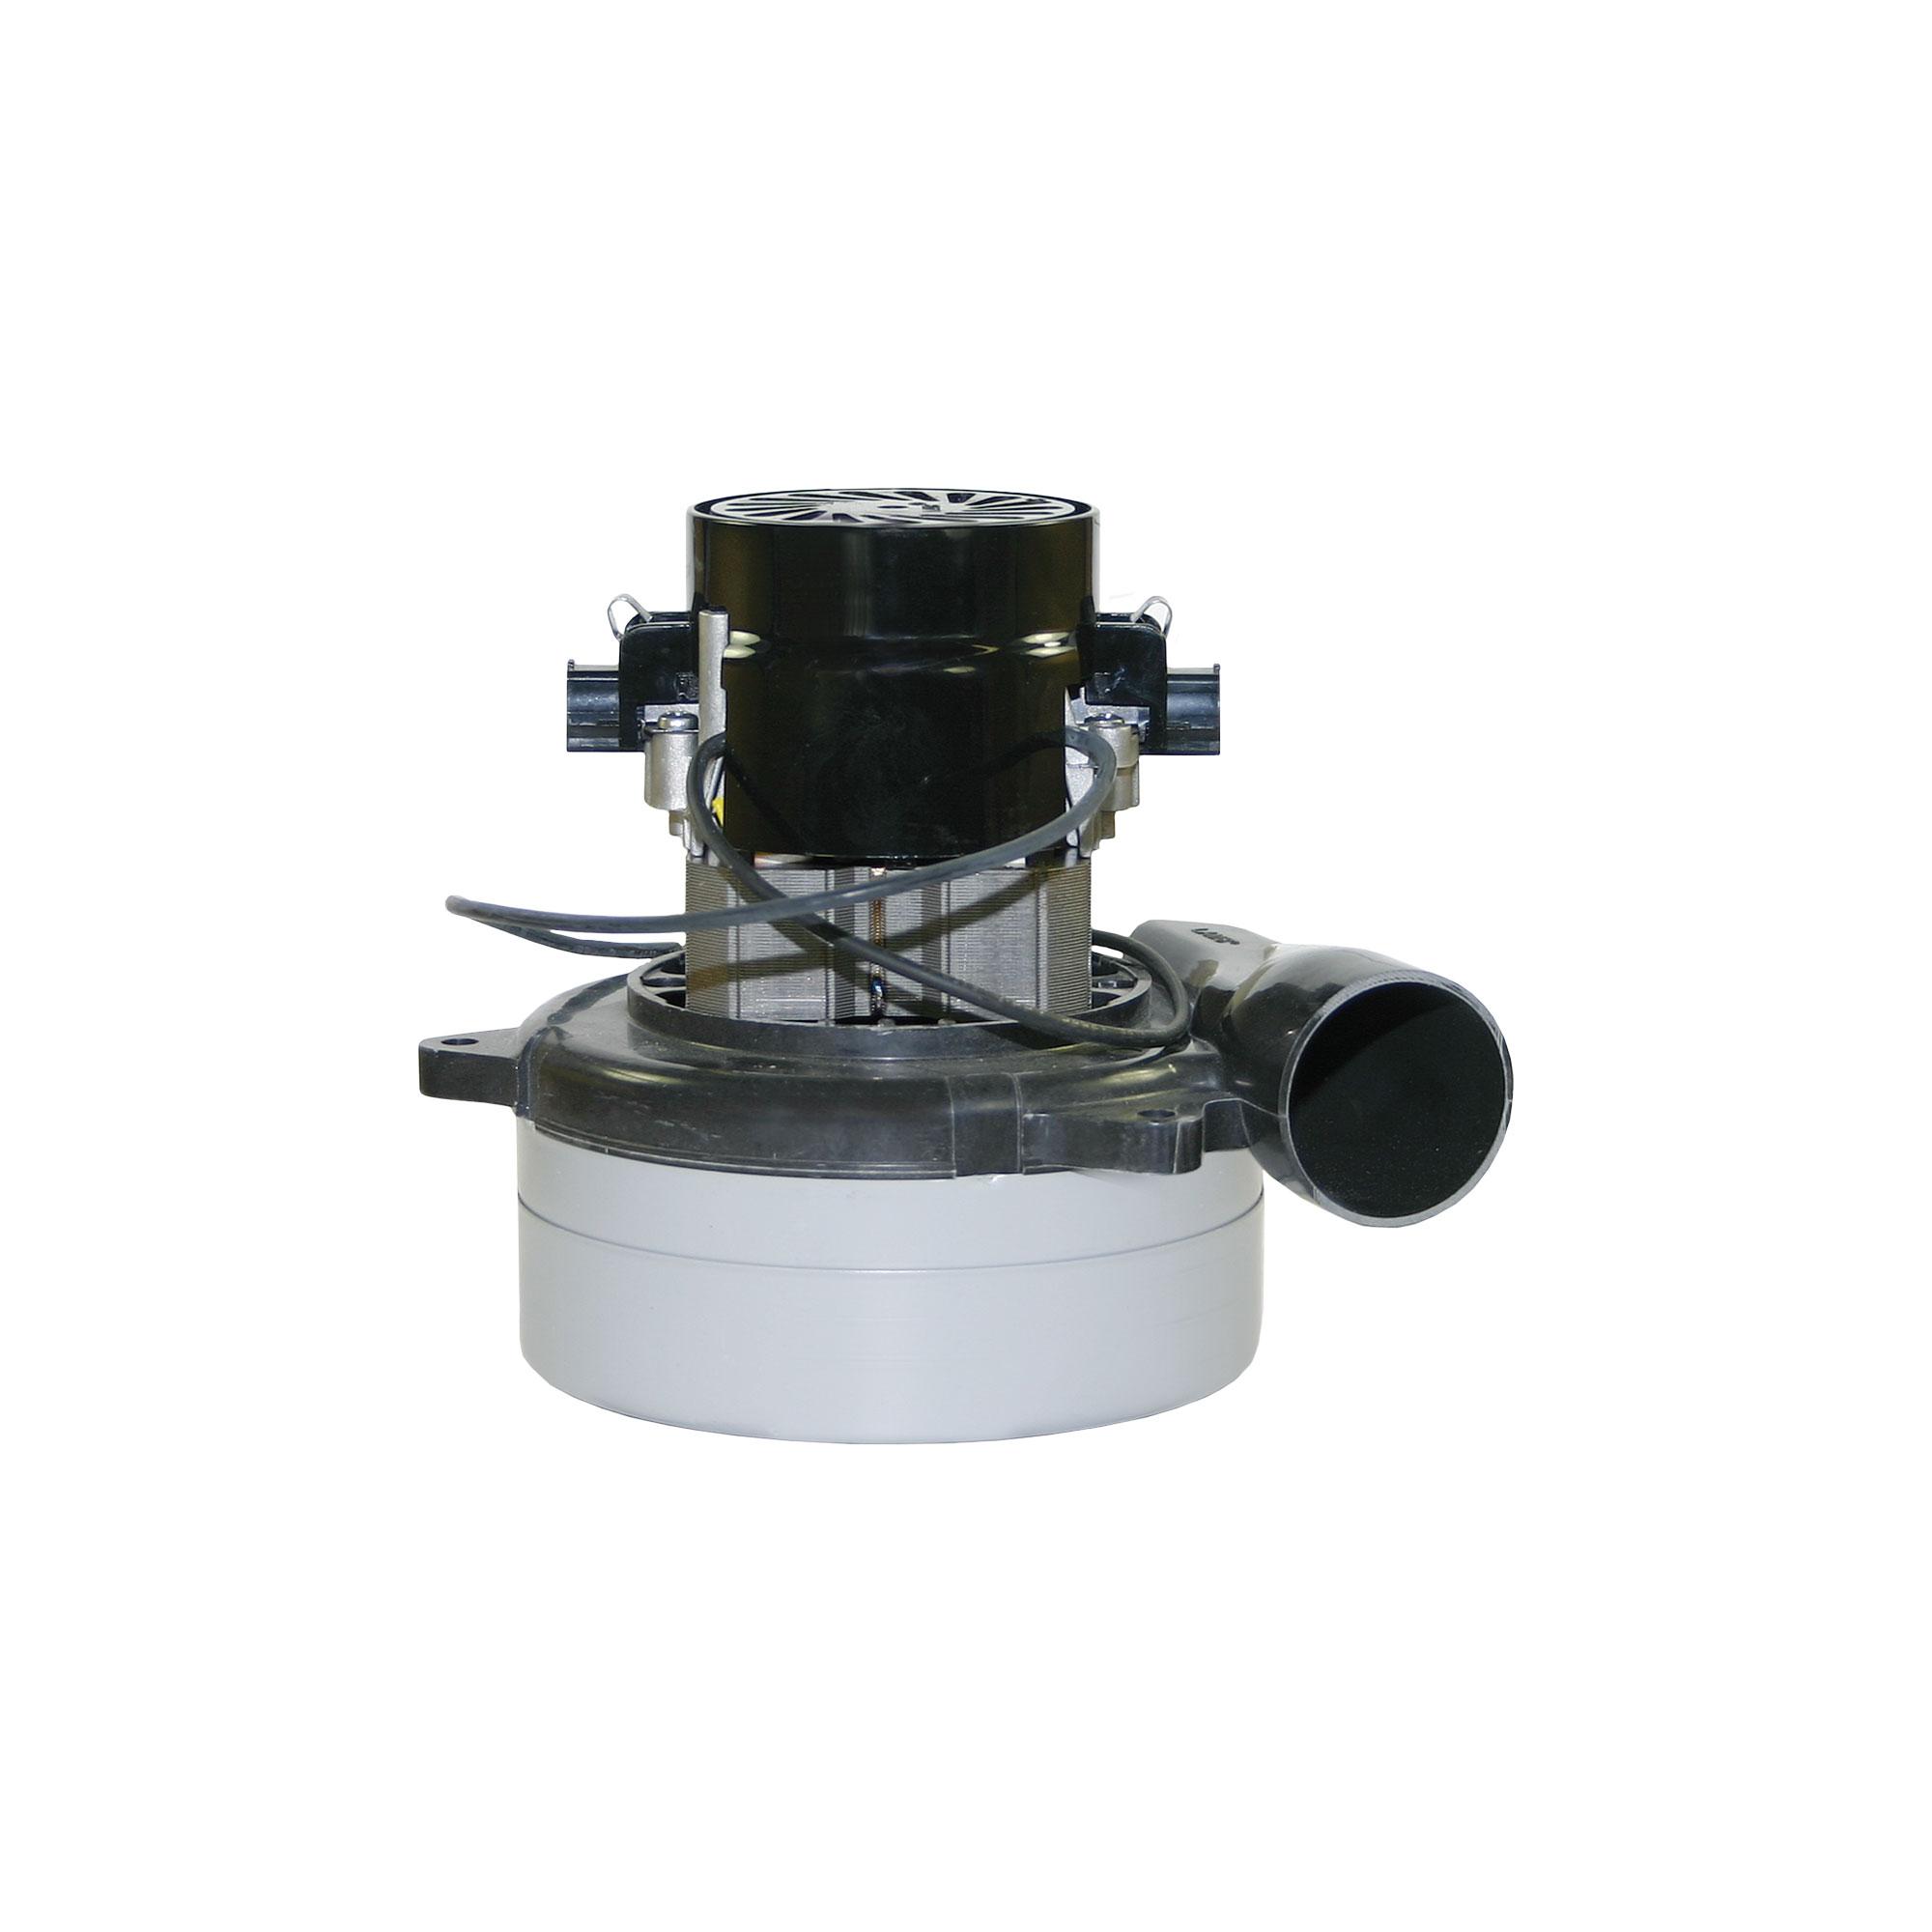 Turbine d'aspiration LAMB AMETEK, Type : 116157-00